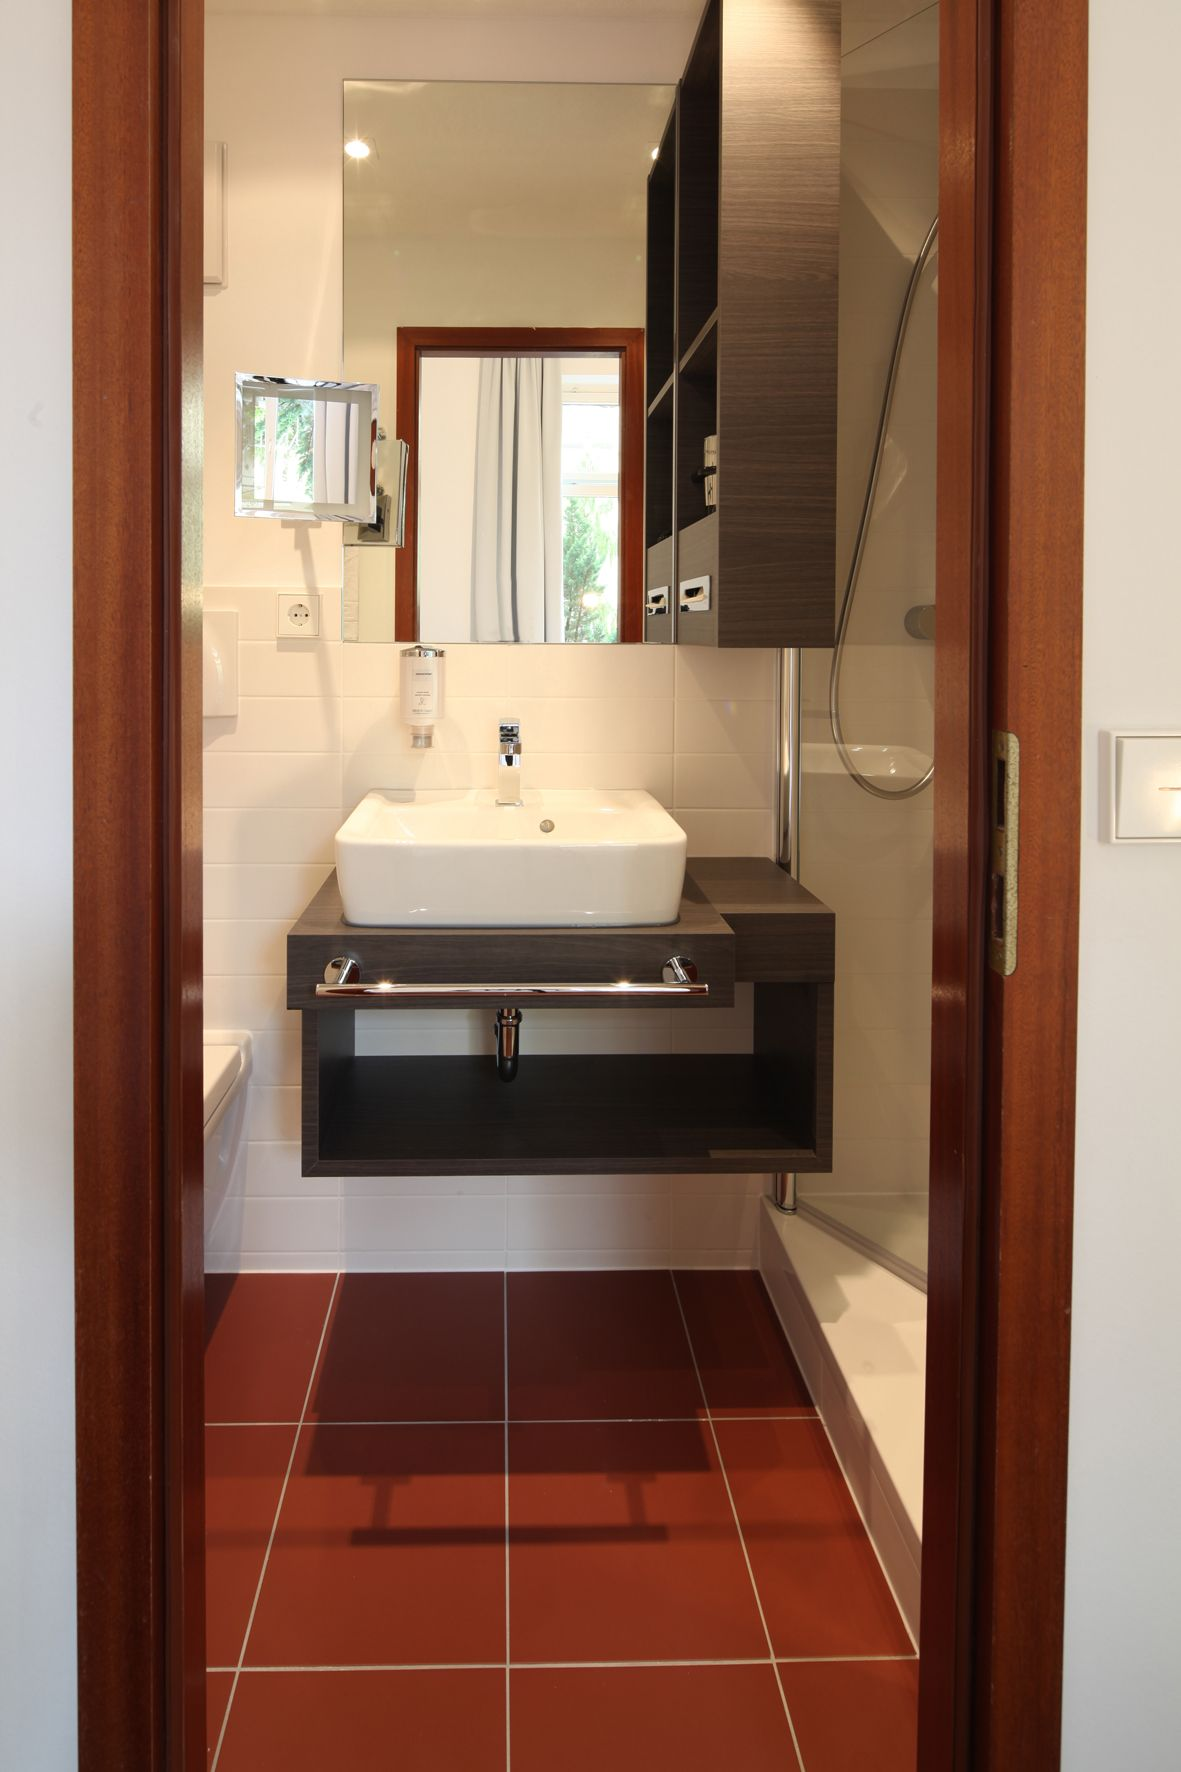 Tiny Hotel Bathroom 20sqft Solution Hotel Bathroom Design Bathroom Design Small Hotel